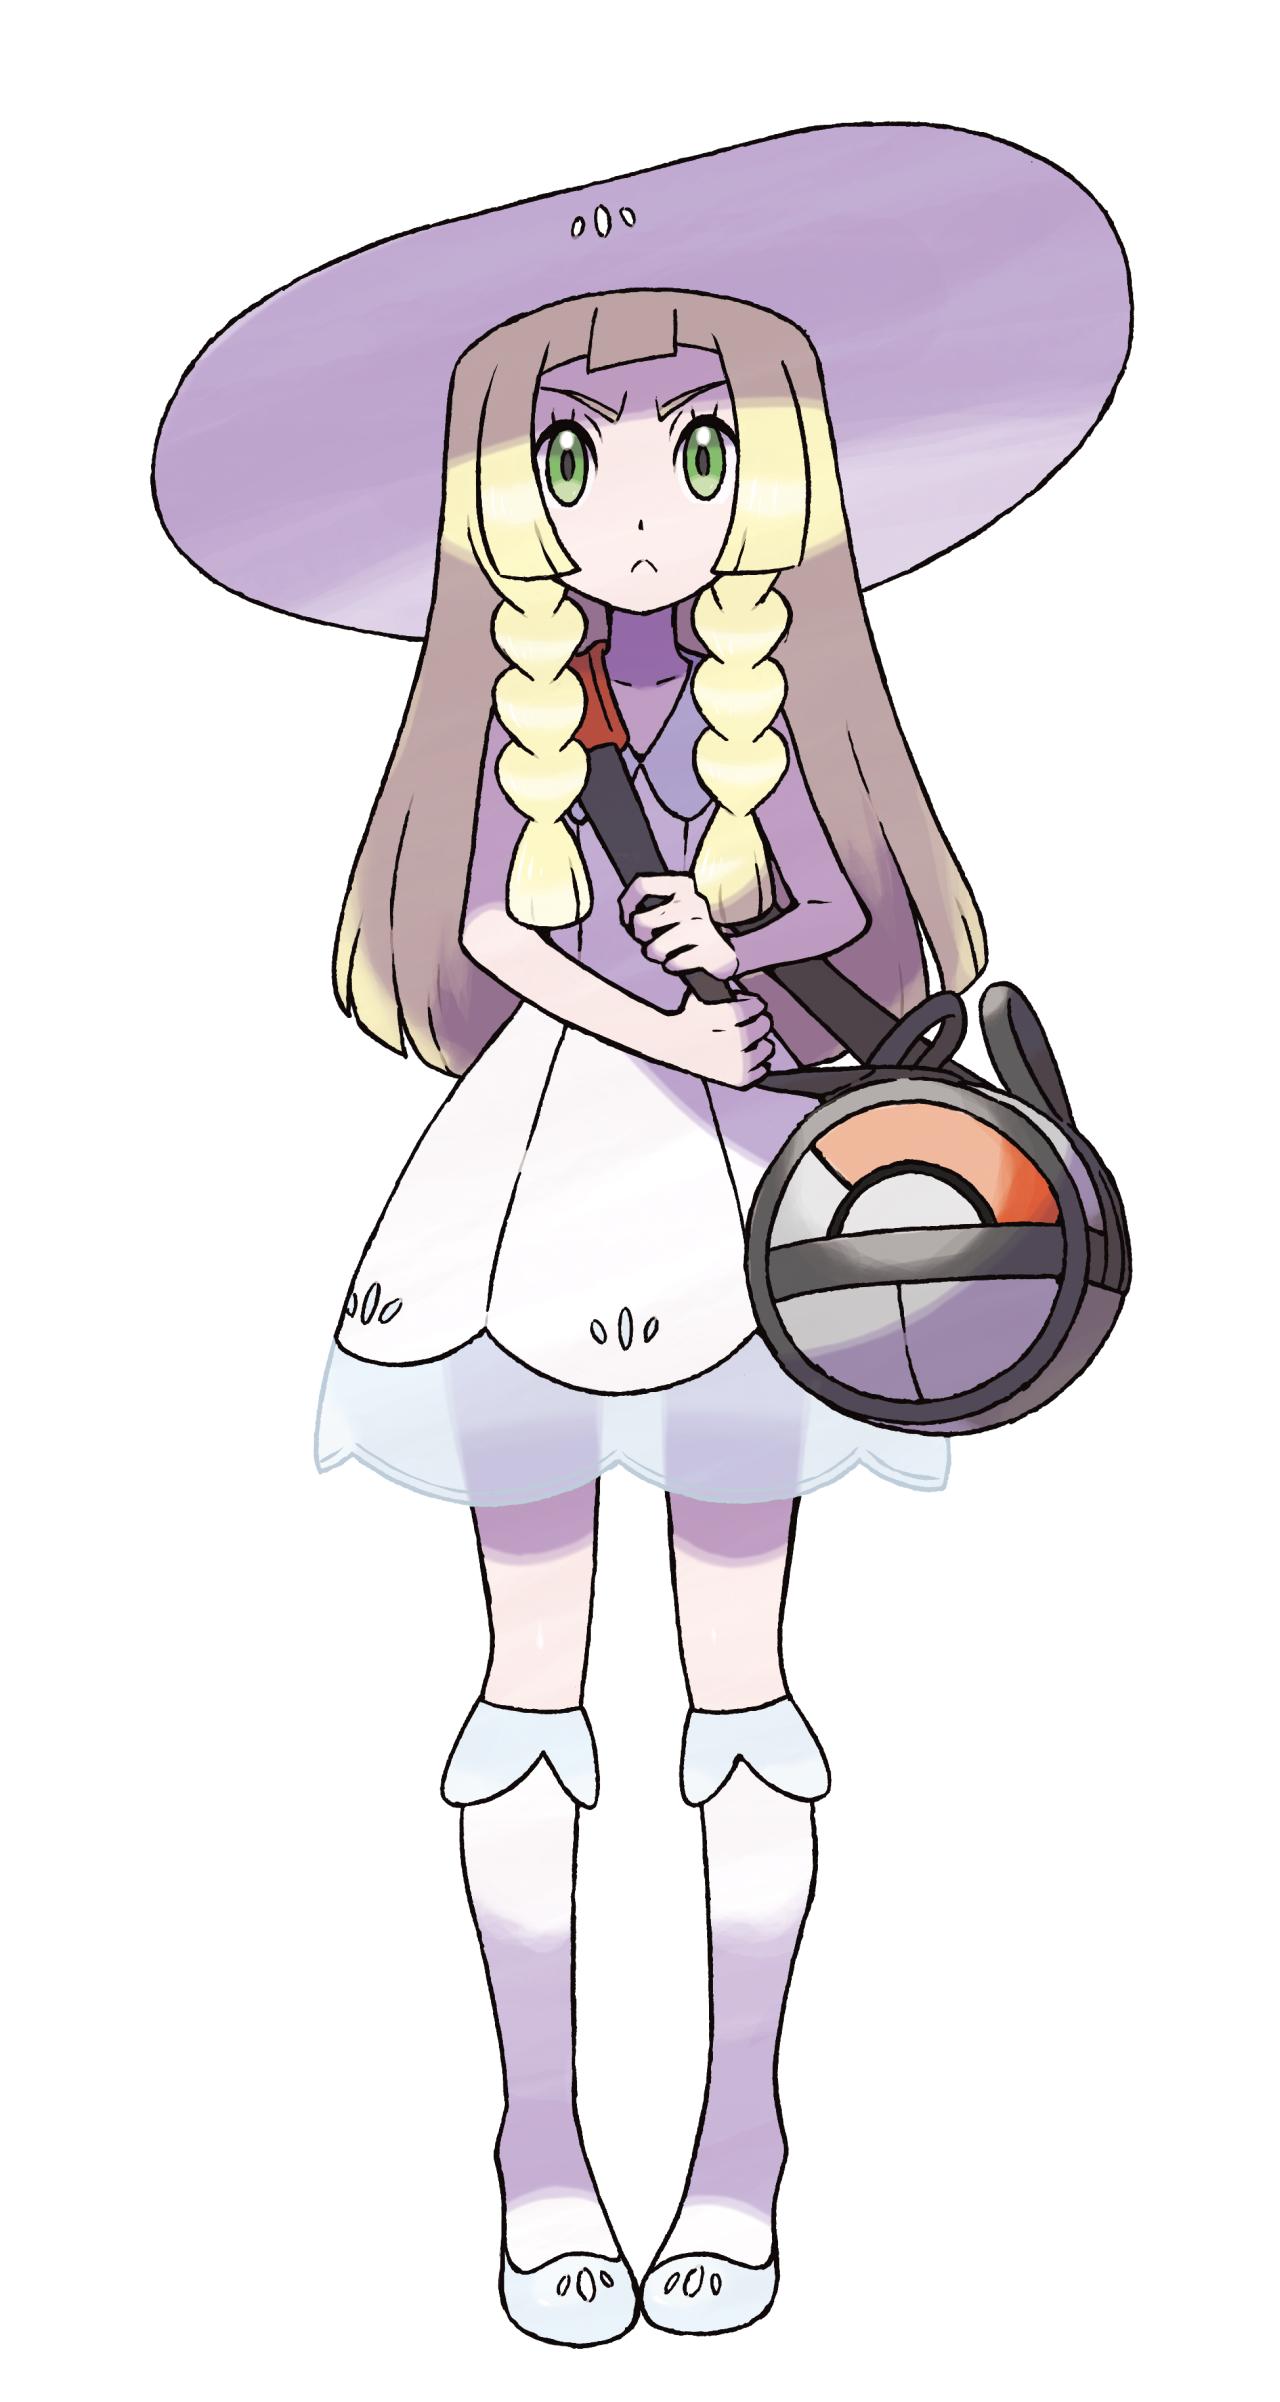 Pokemon sun and moon serebii - f8c